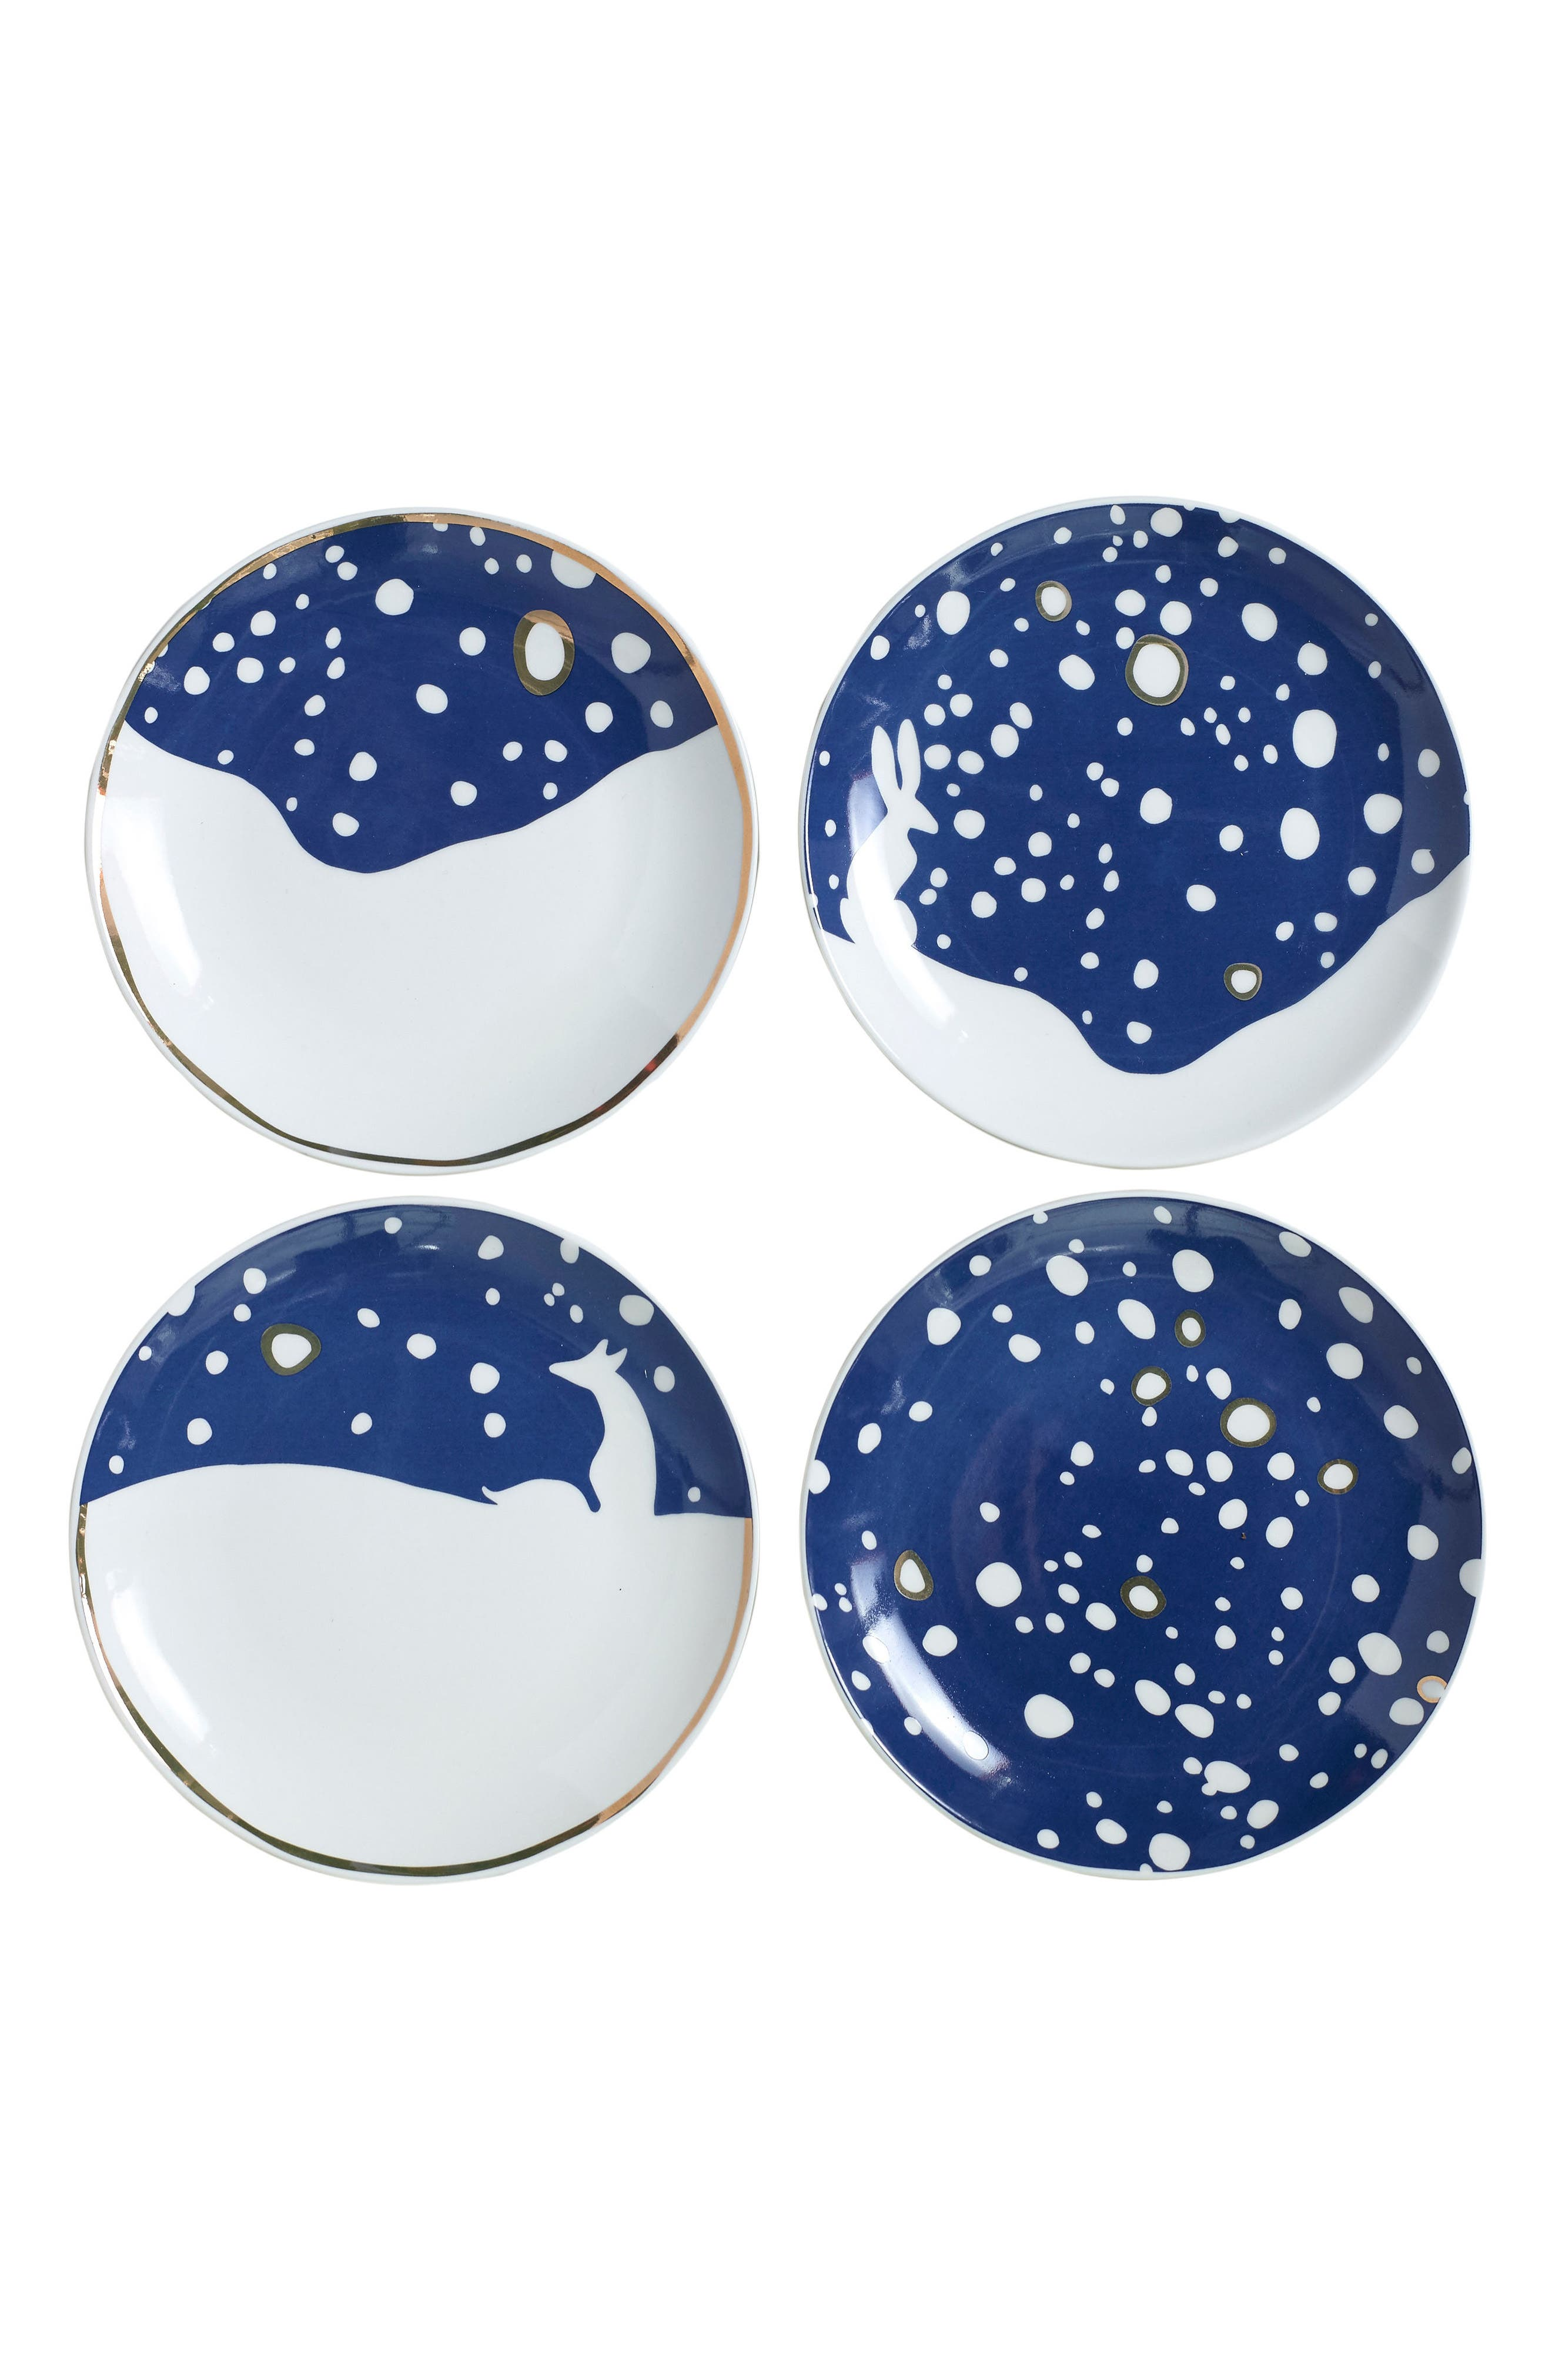 Eric & Eloise Snowy Set of 4 Assorted Plates,                             Main thumbnail 1, color,                             Blue